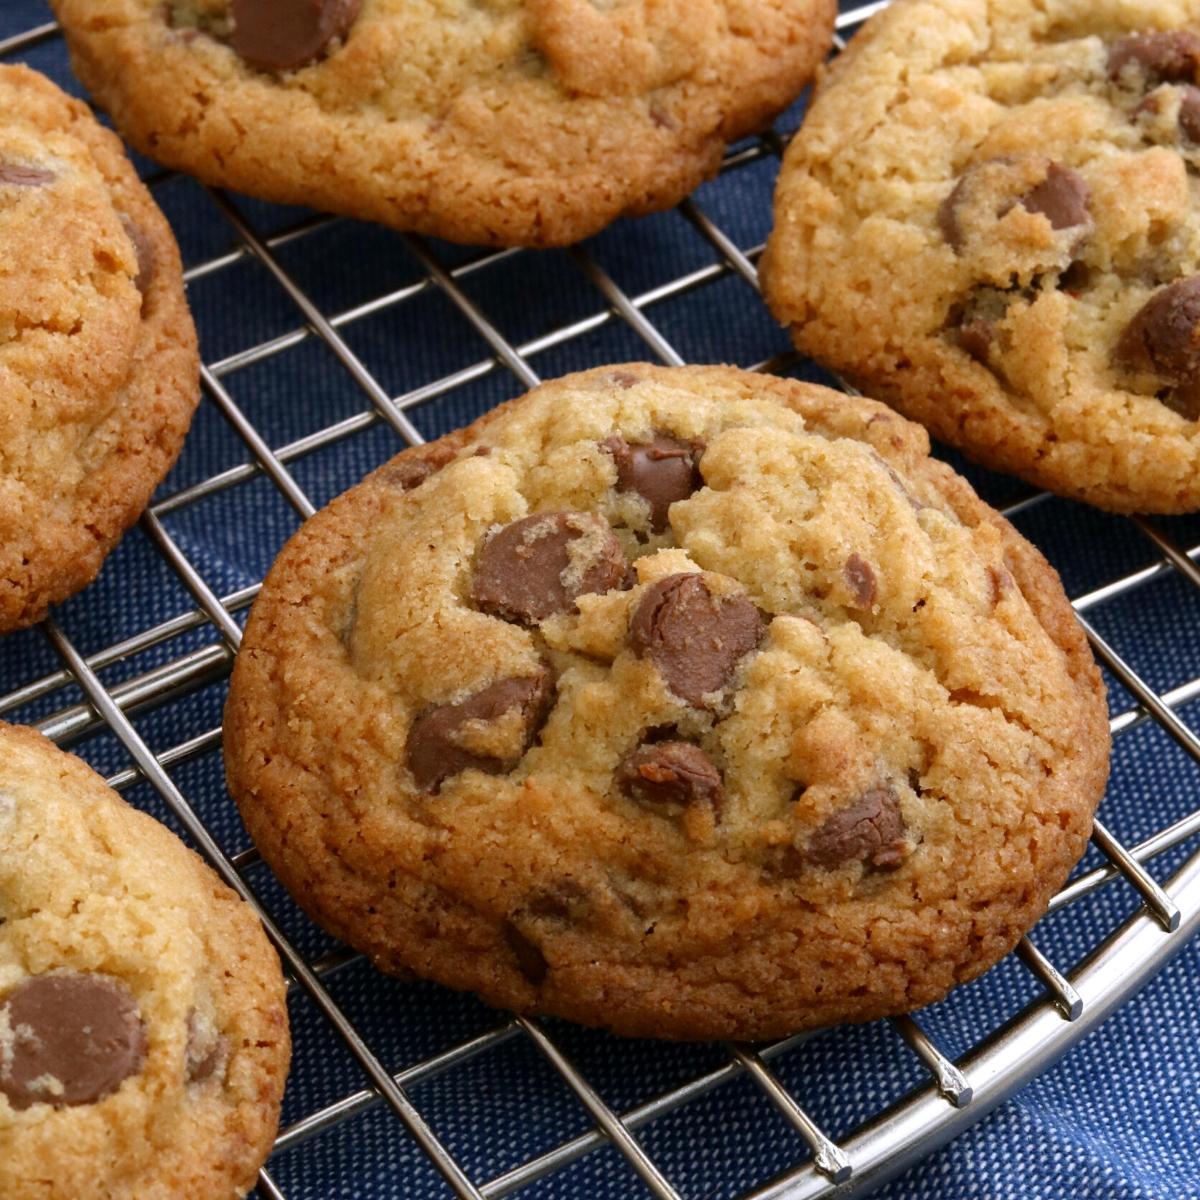 Vegan Gluten Free Chocolate Chip Cookies Recipe